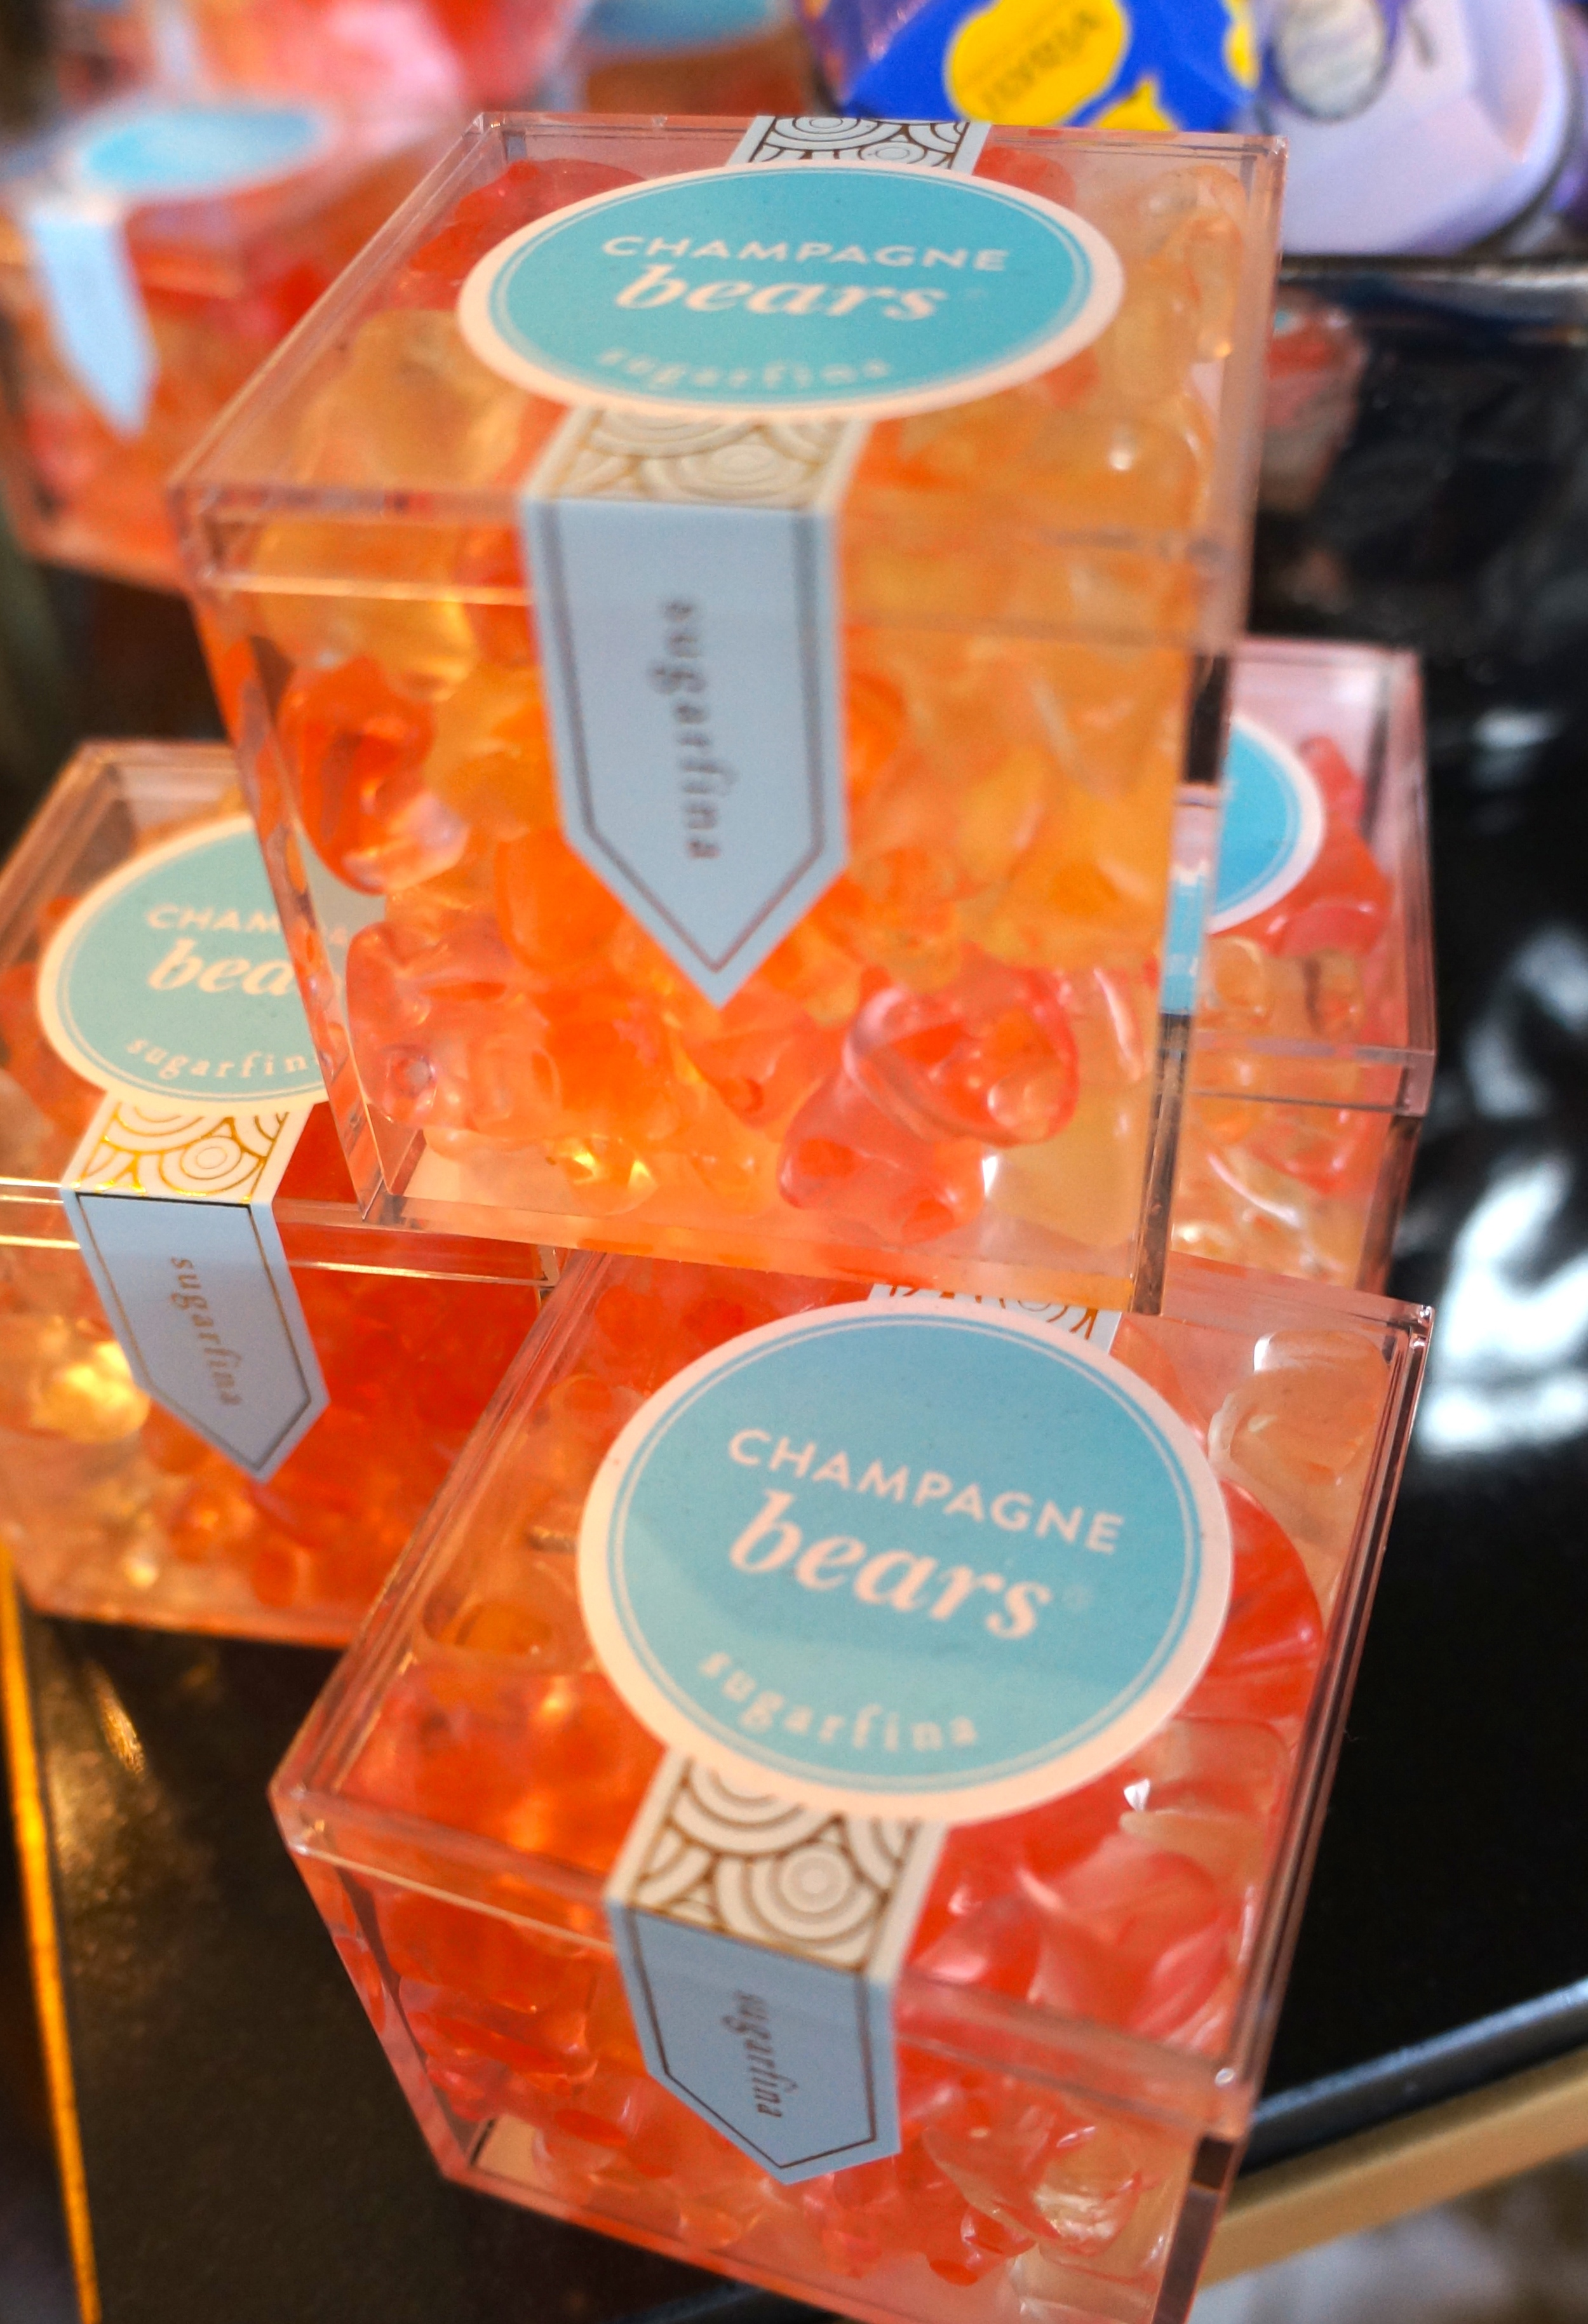 Sugarfina champagne gummy bears, always a huge hit!